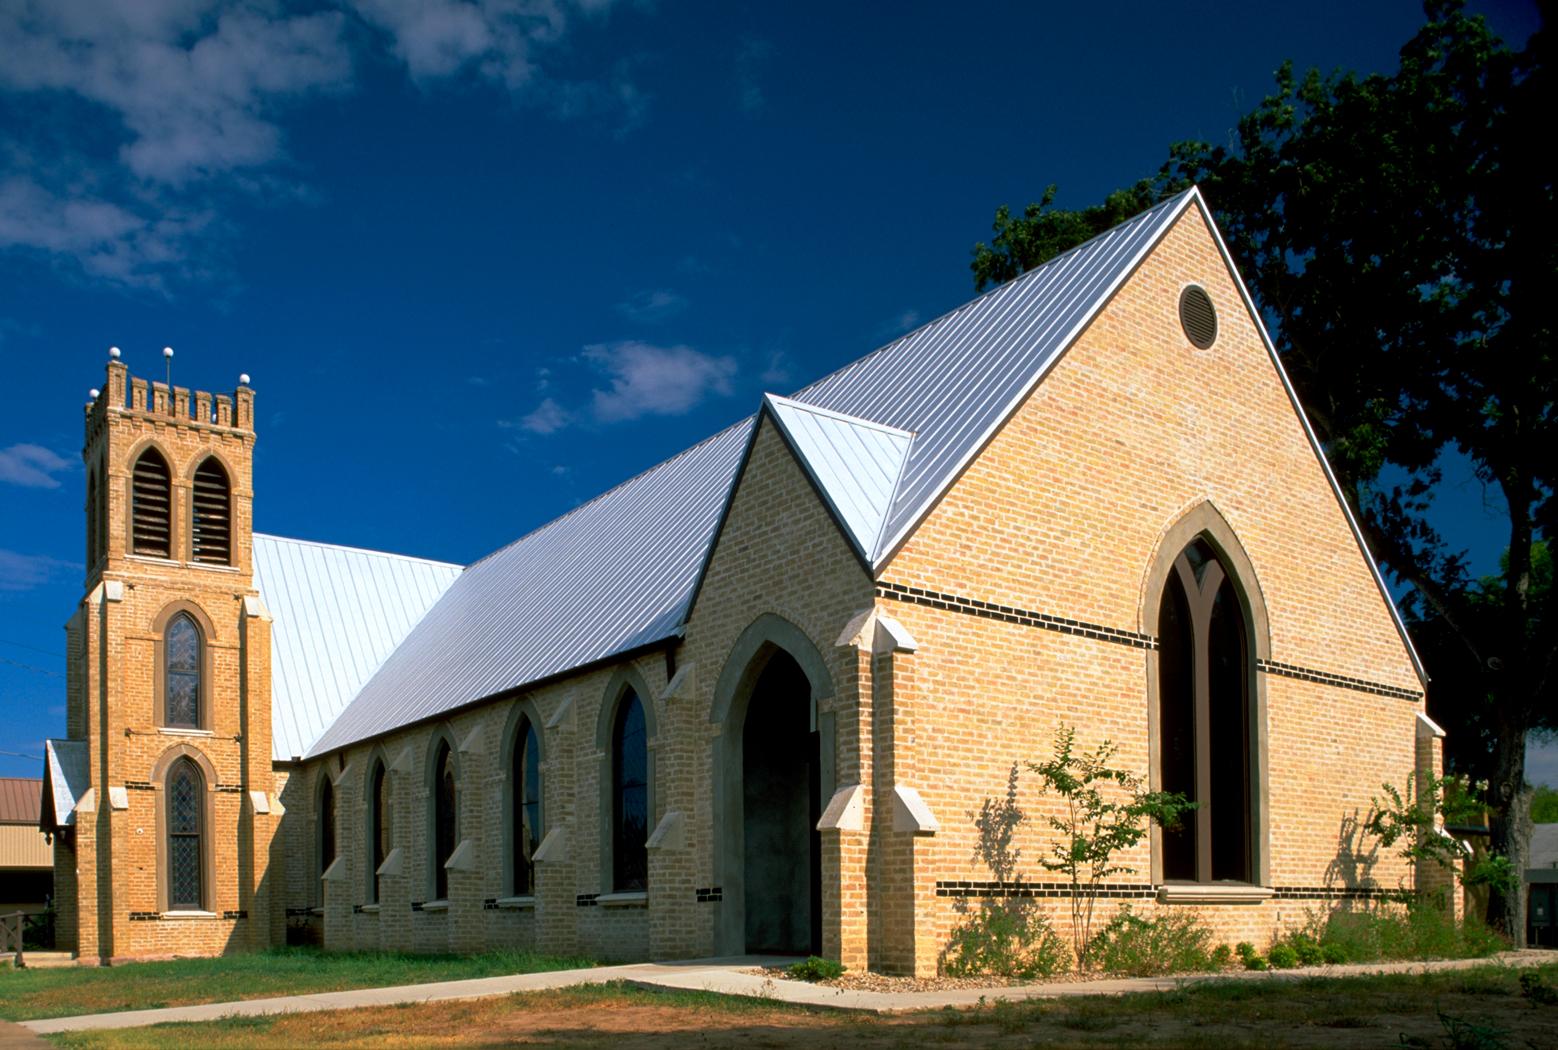 RLG's Calvary Episcopal Church Project